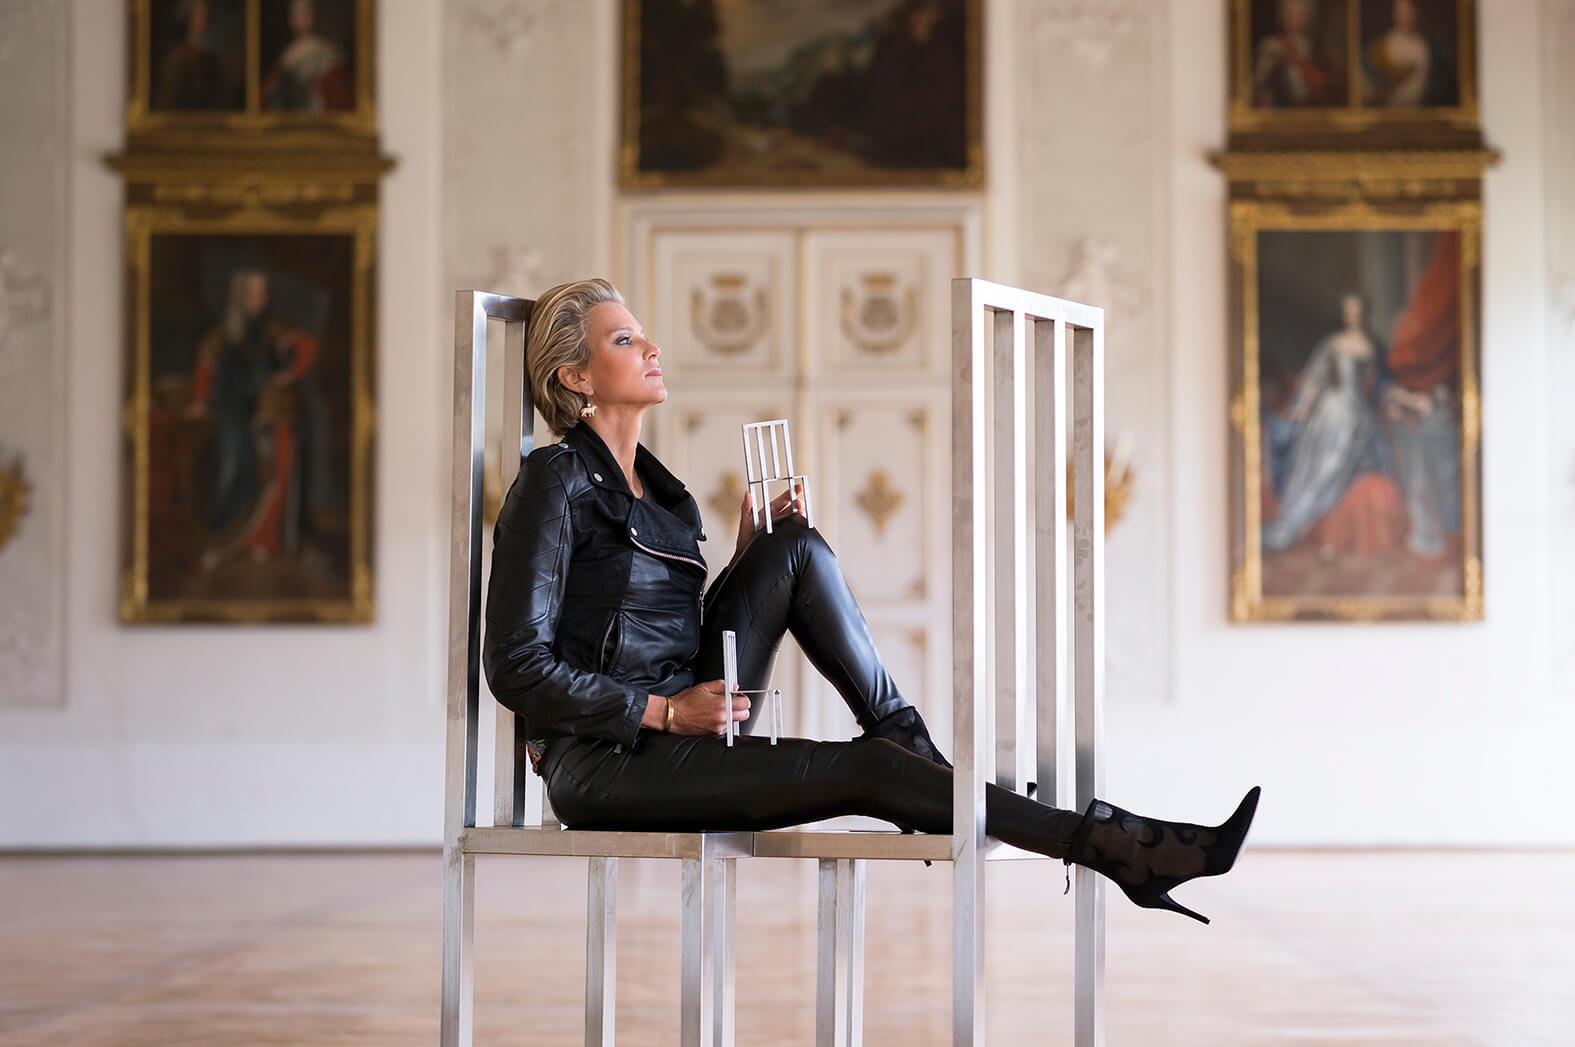 stephanie gr fin von pfuel reportage. Black Bedroom Furniture Sets. Home Design Ideas